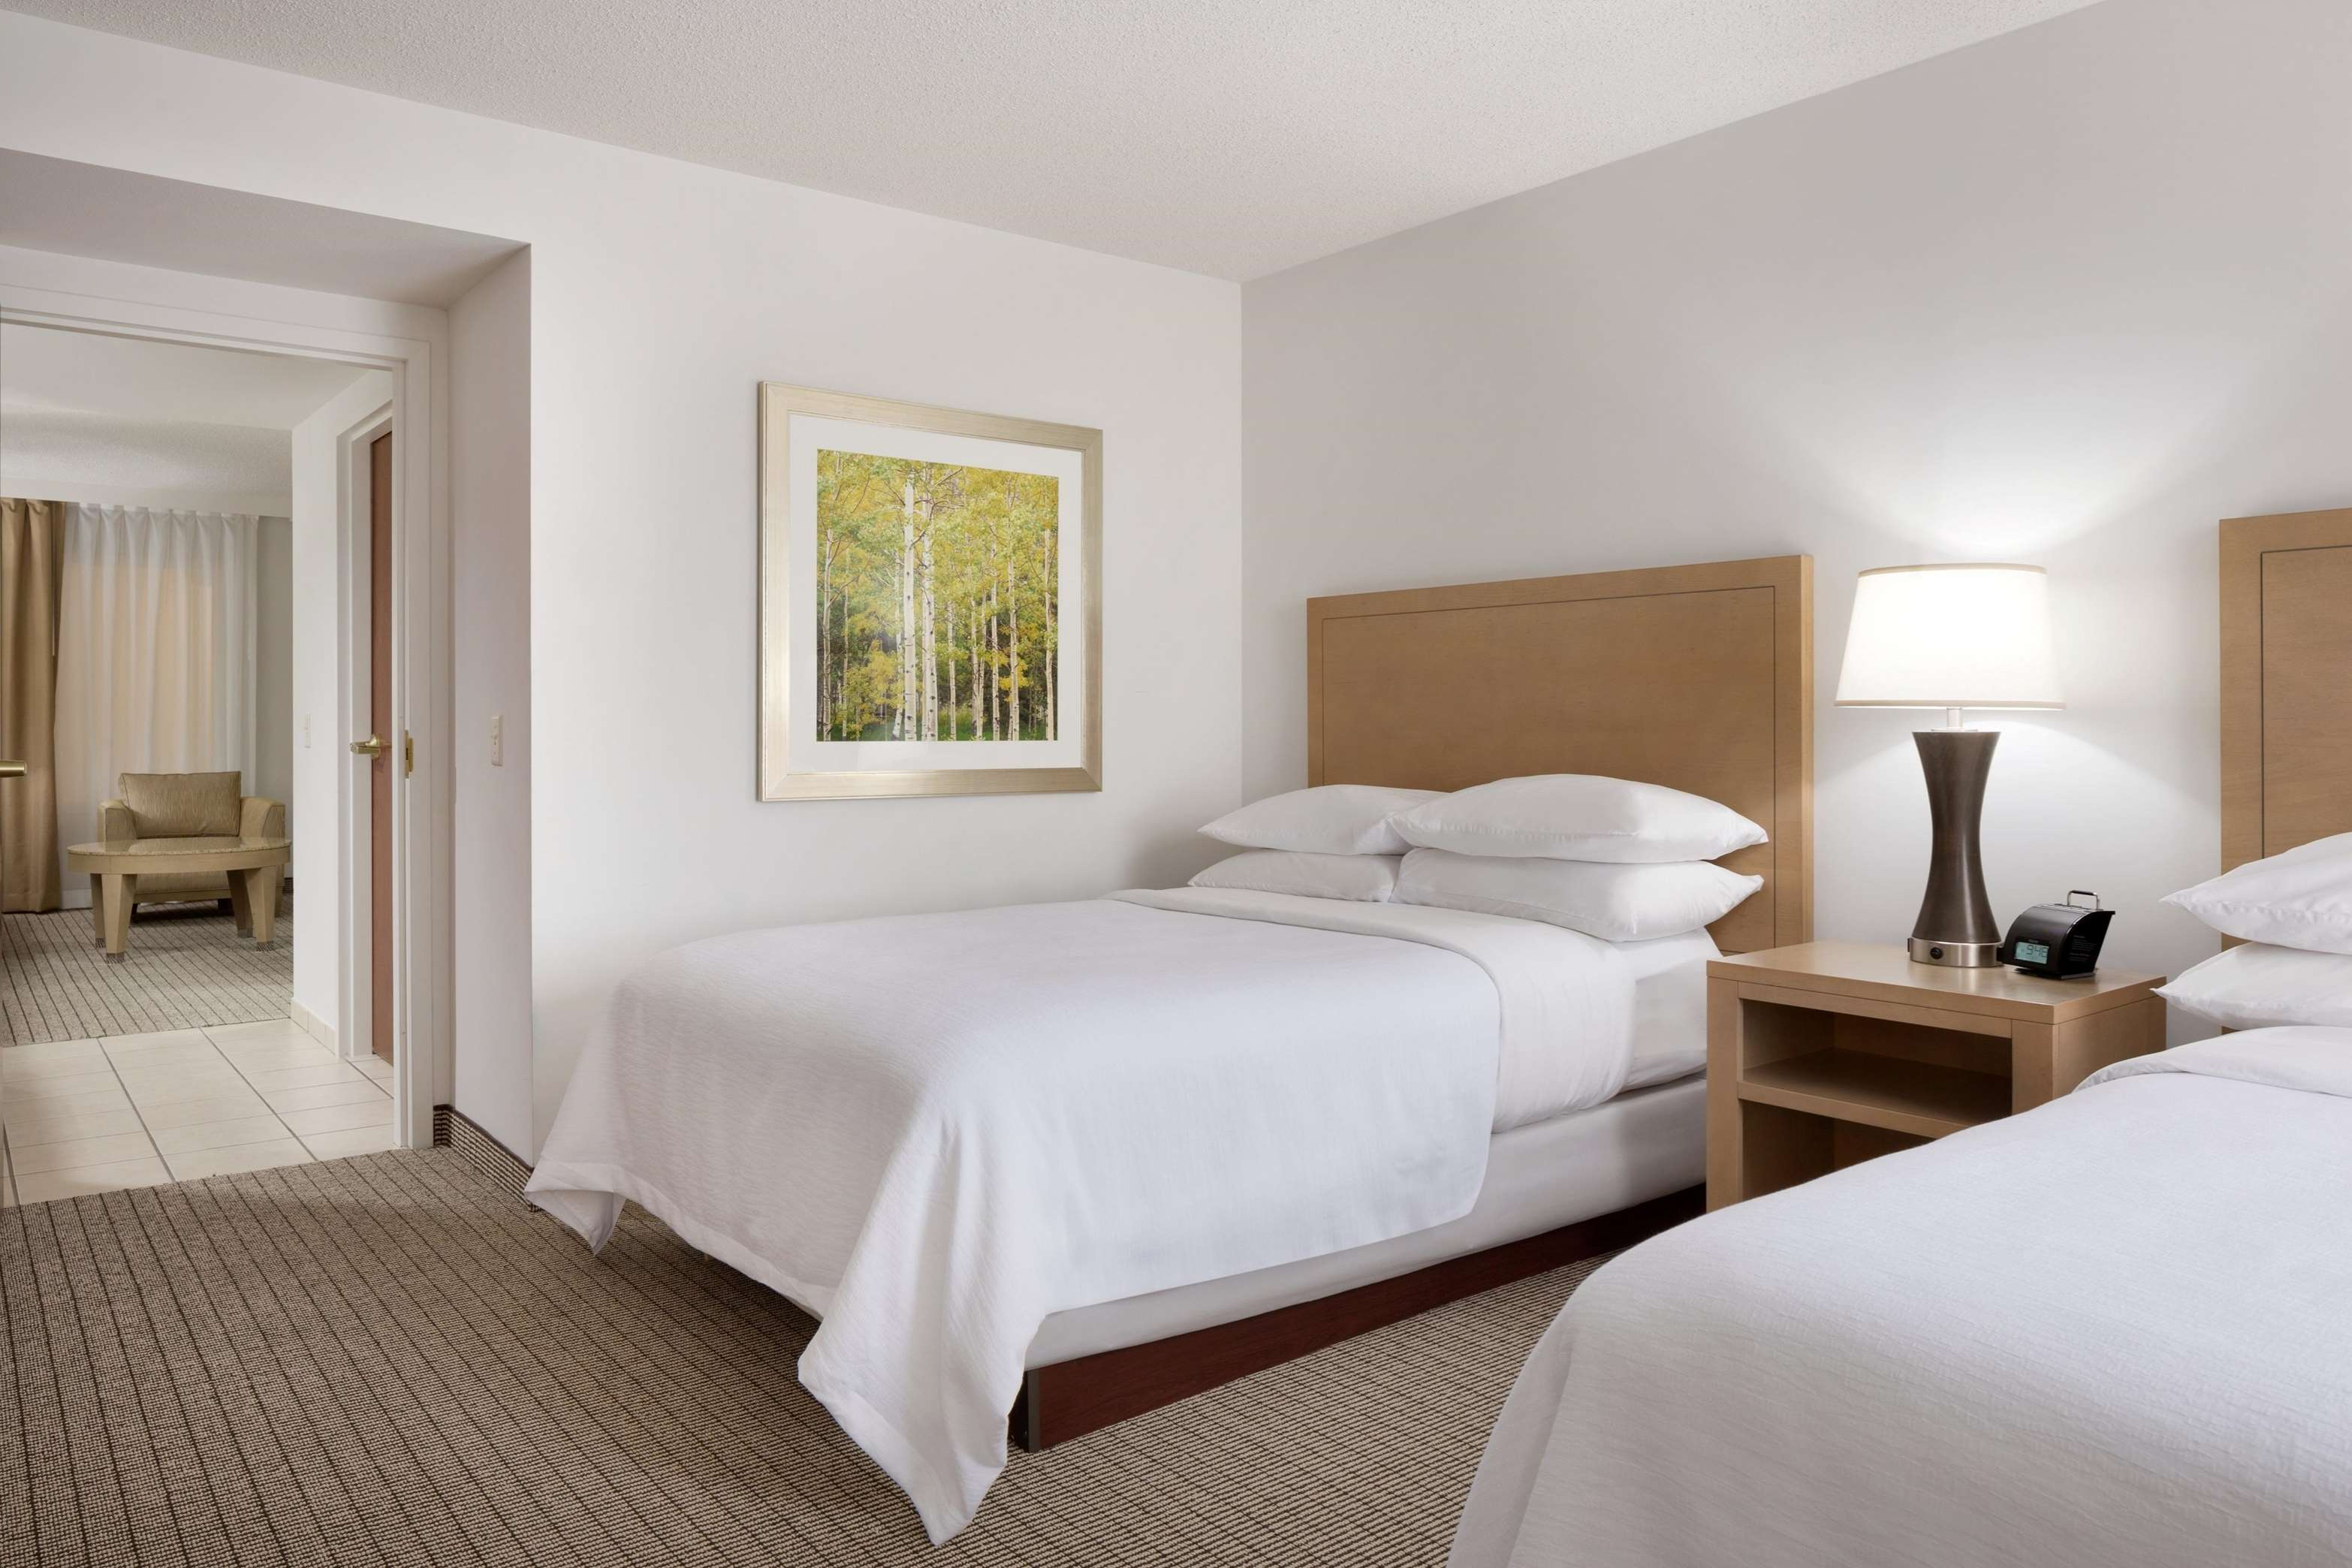 Embassy Suites by Hilton Denver International Airport image 25